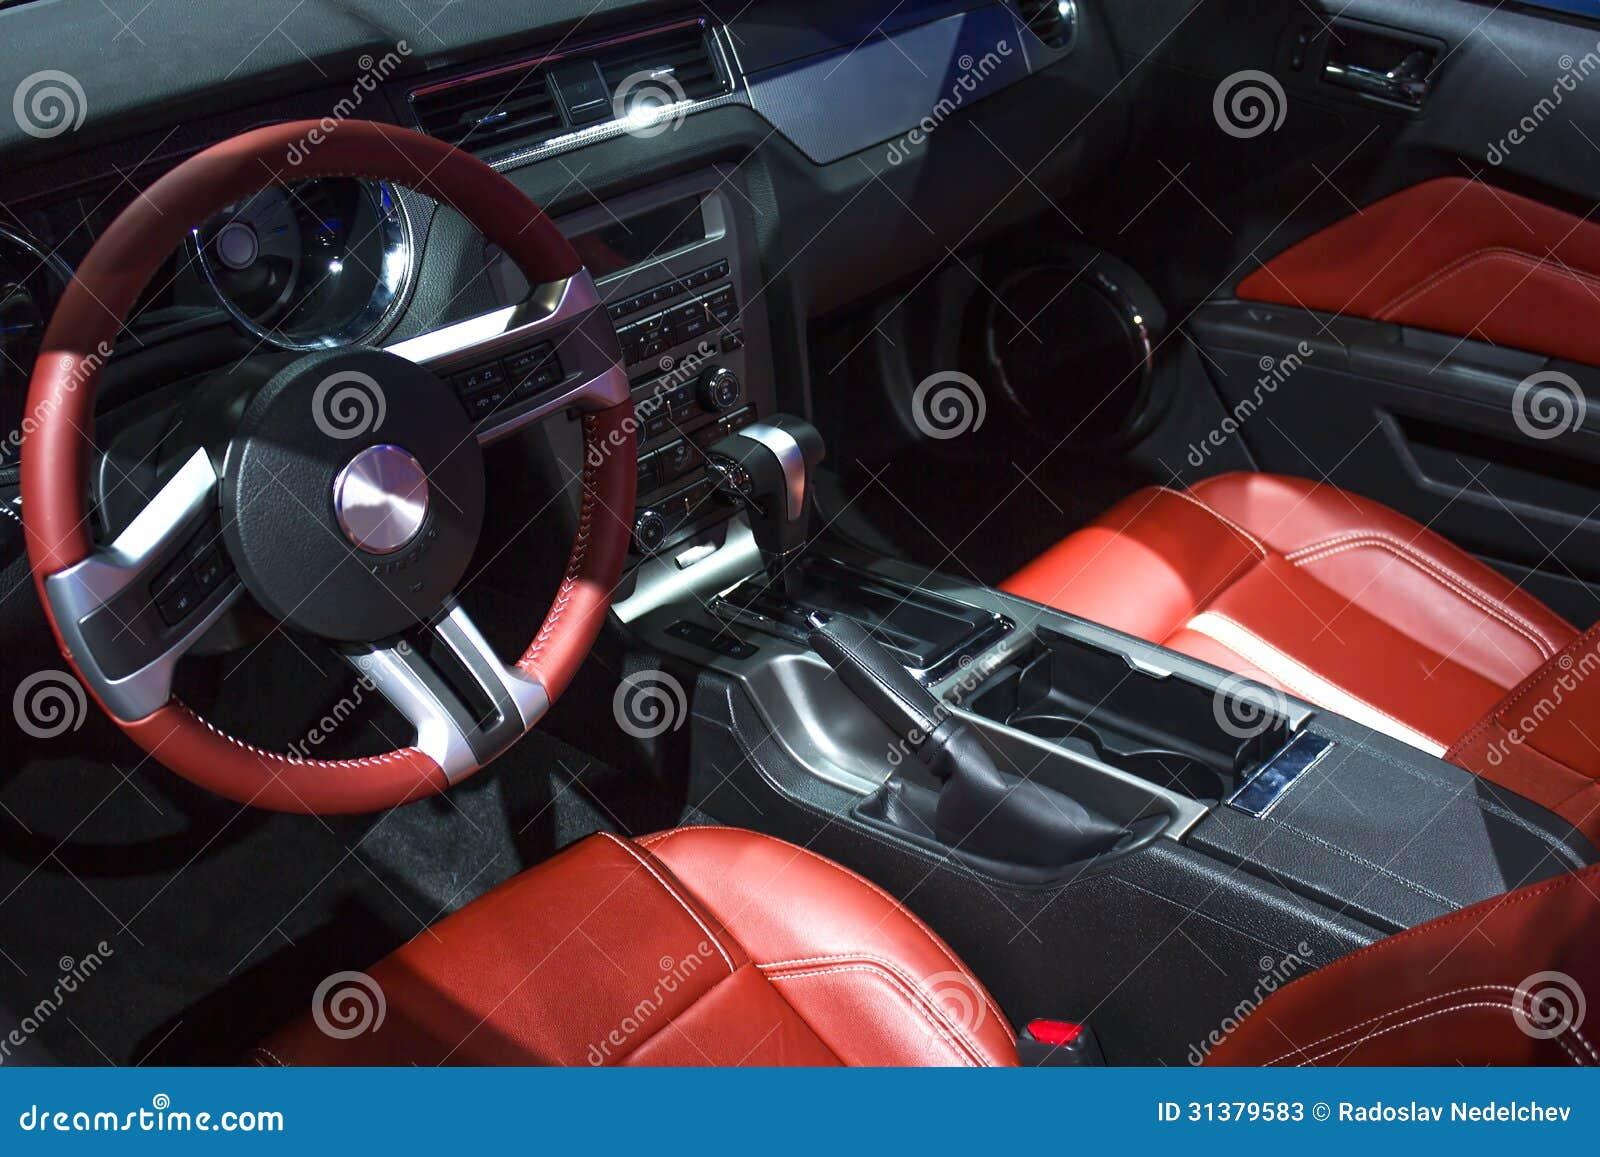 car interior stock photos image 31379583. Black Bedroom Furniture Sets. Home Design Ideas